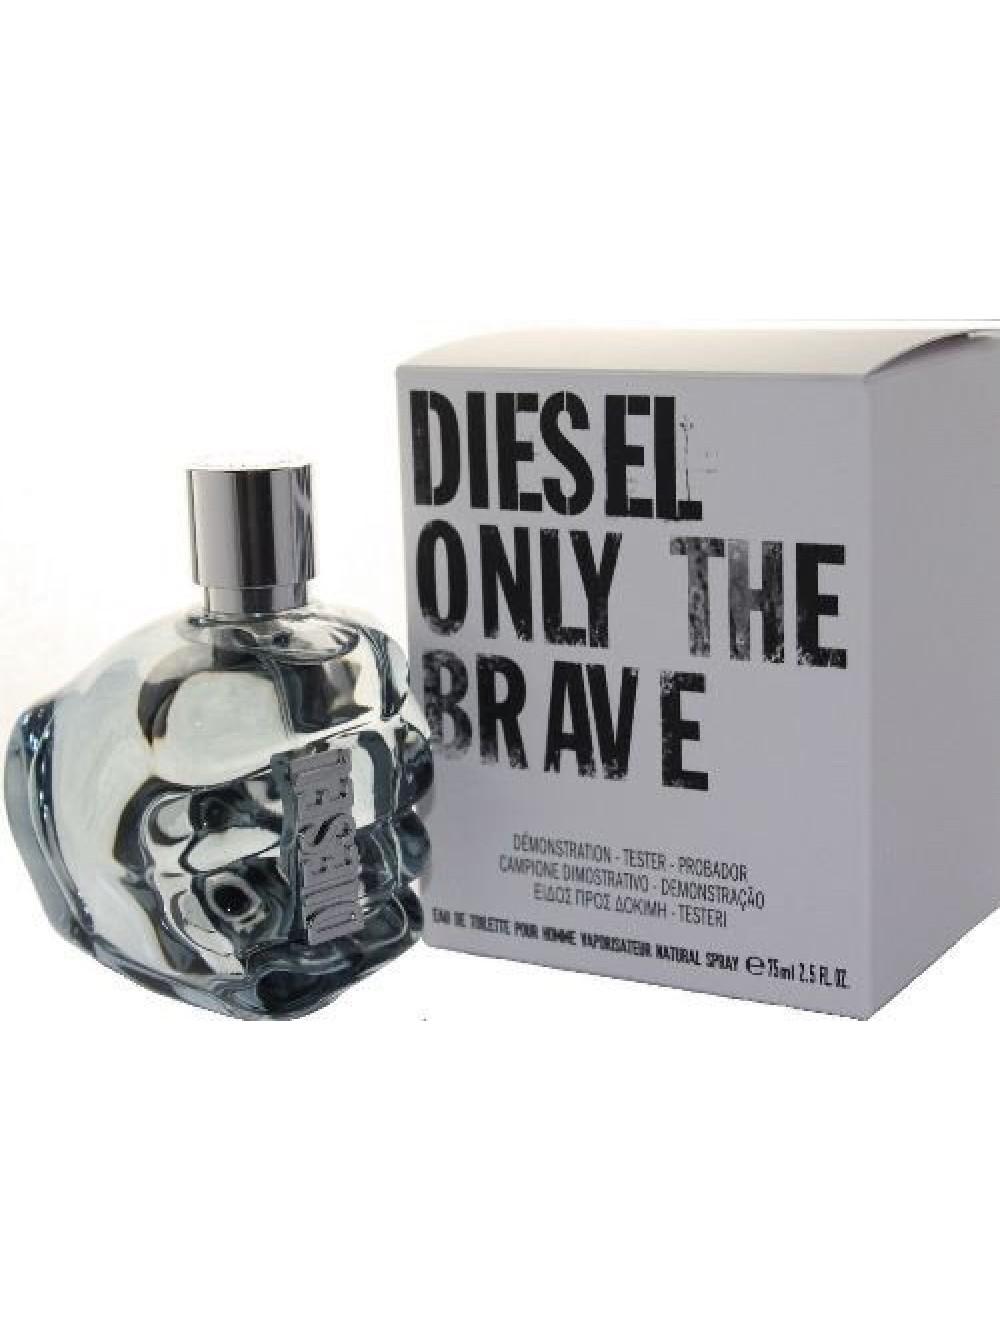 купить Diesel Only The Brave тестер туалетная вода 75 мл в